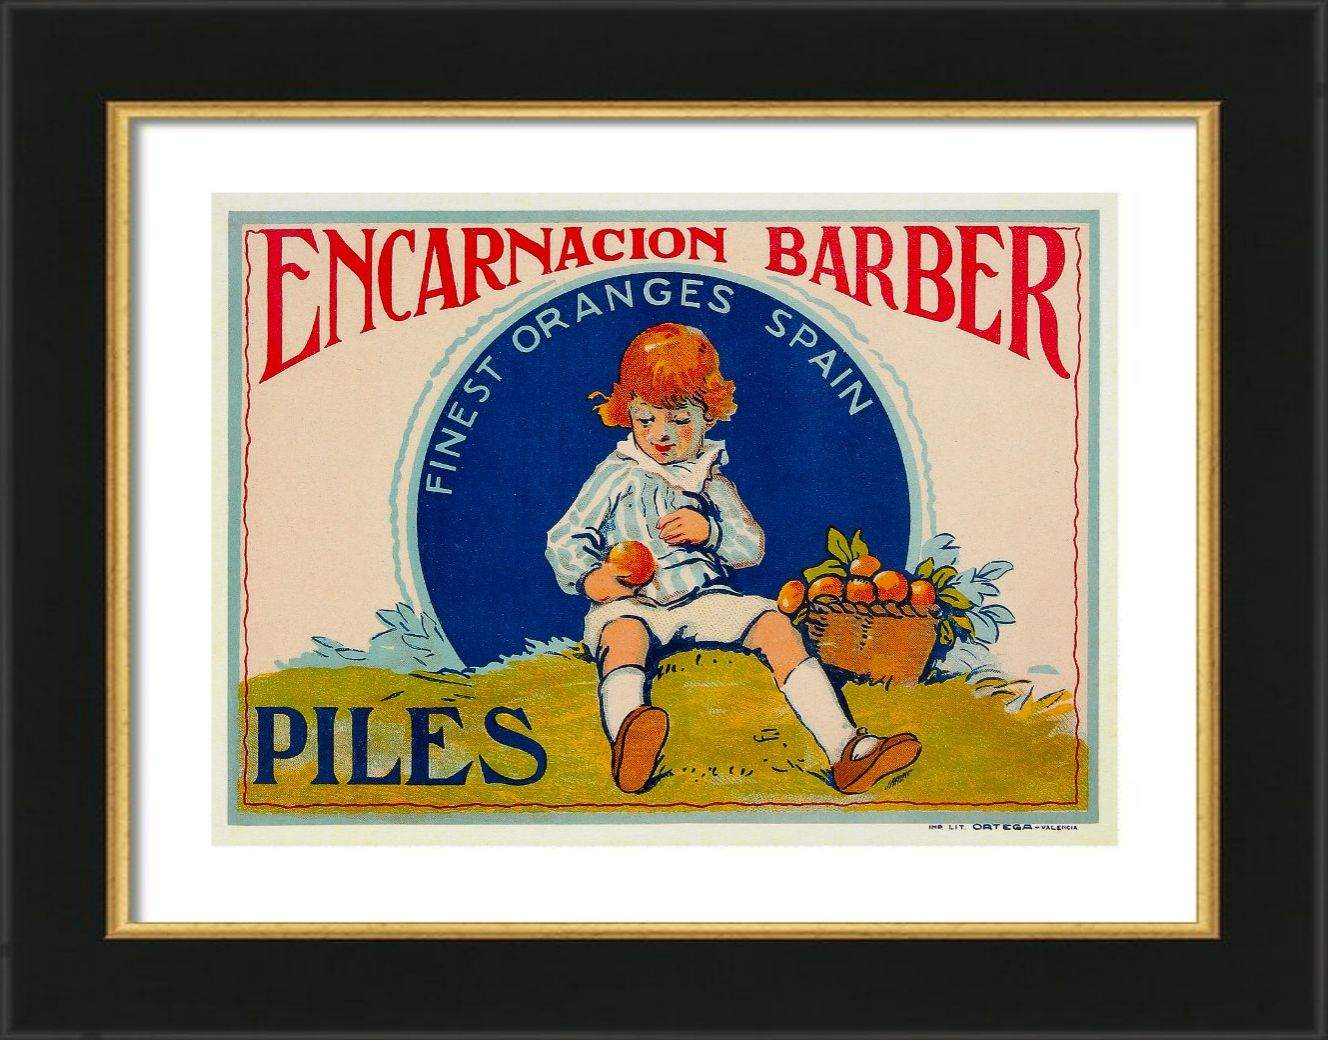 Spanish Oranges - Vintage Advertising Poster | Zazzle.com ...